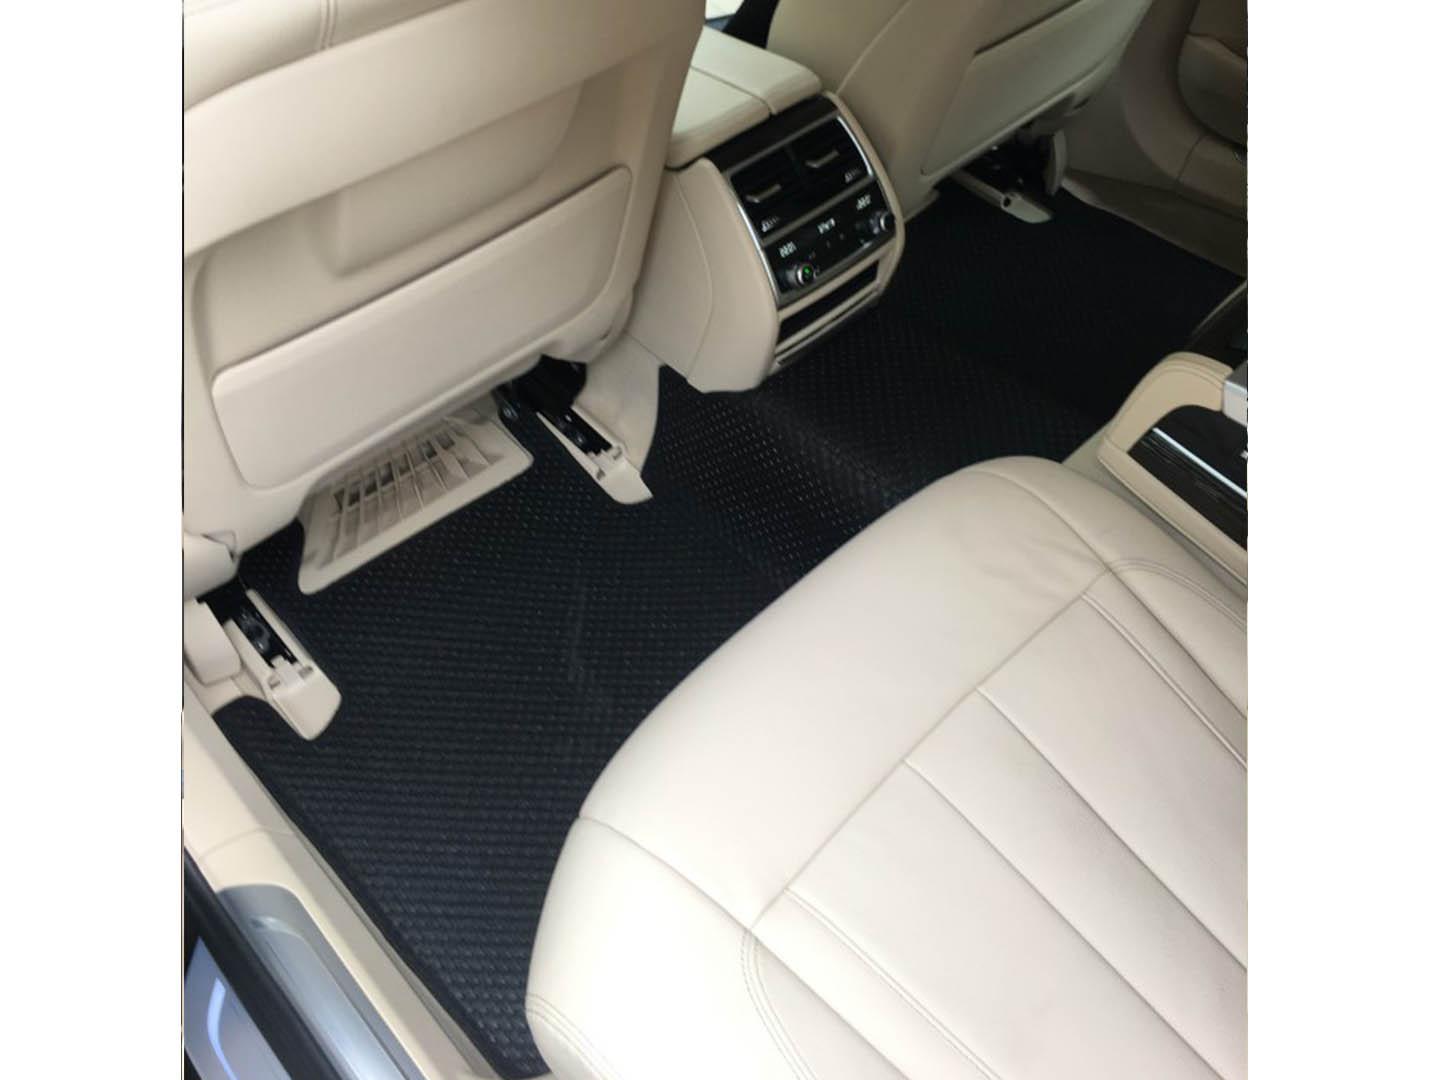 Thảm lót sàn BMW 730LI